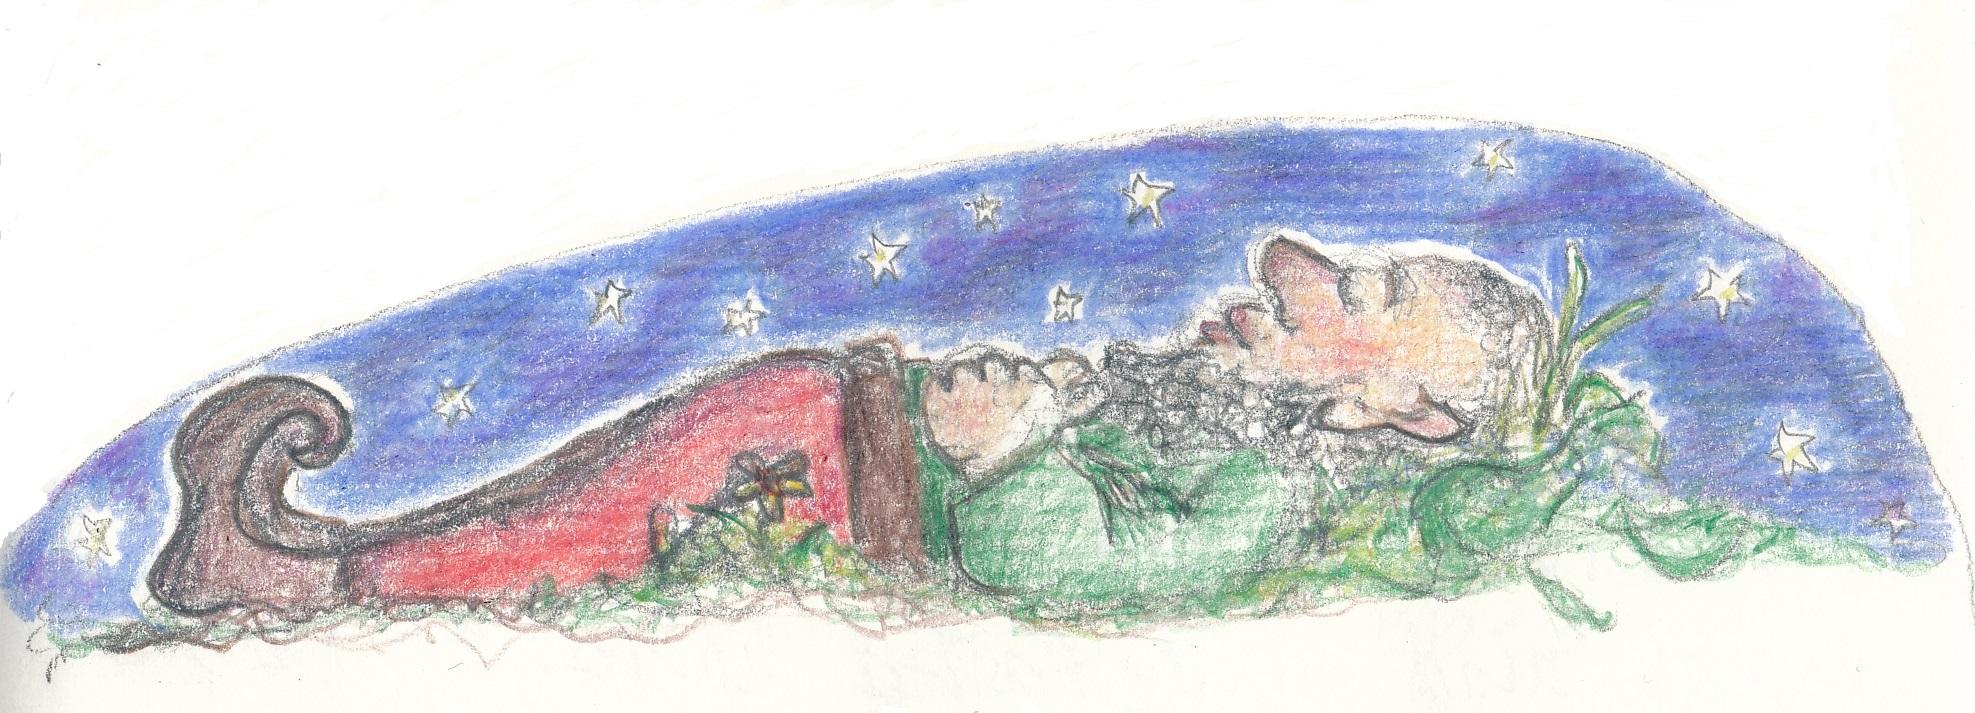 skry under stars1